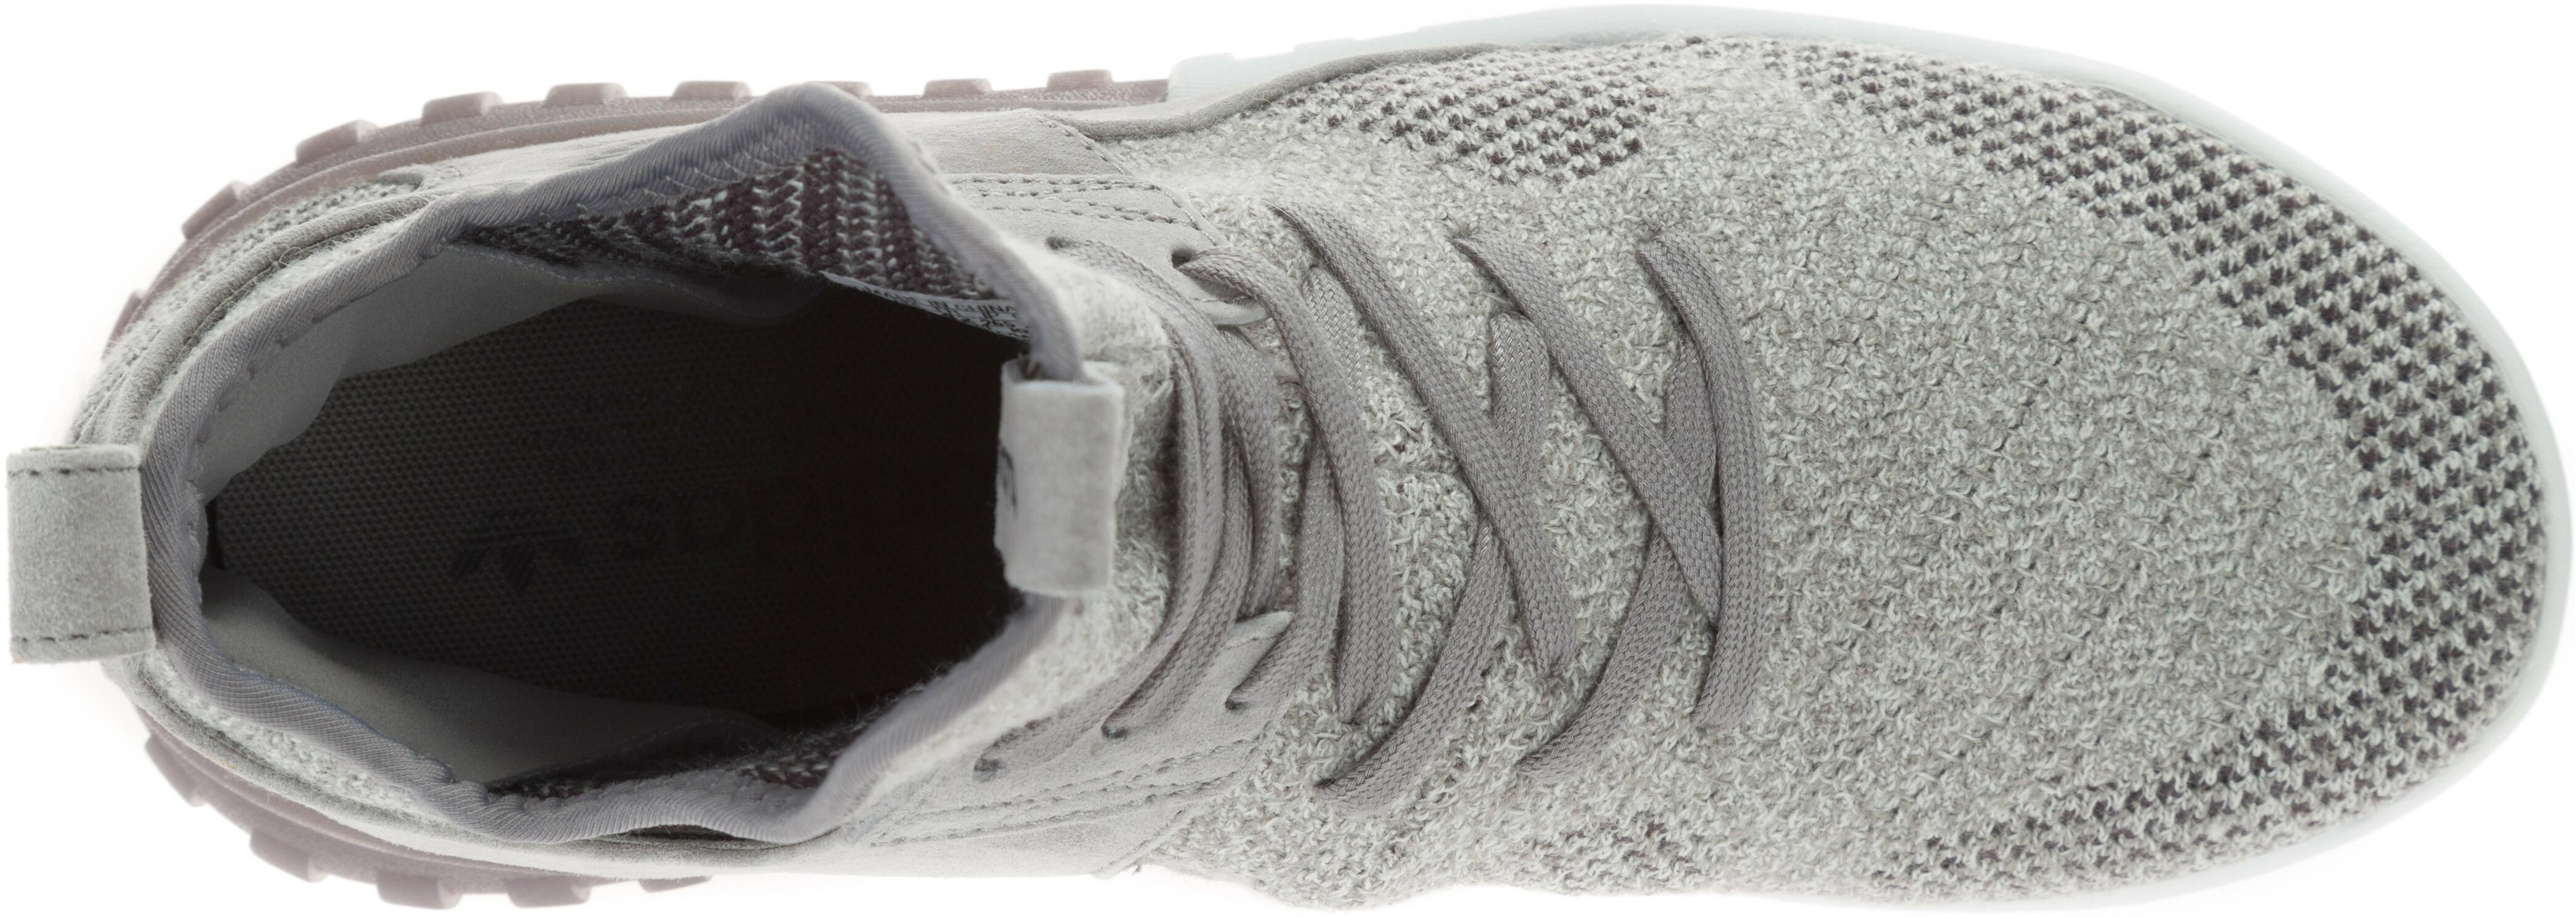 Adidas Originals Originals adidas Originals Tubular Tubular X Primeknit 9175 Tenisówki faad6f2 - grind.website